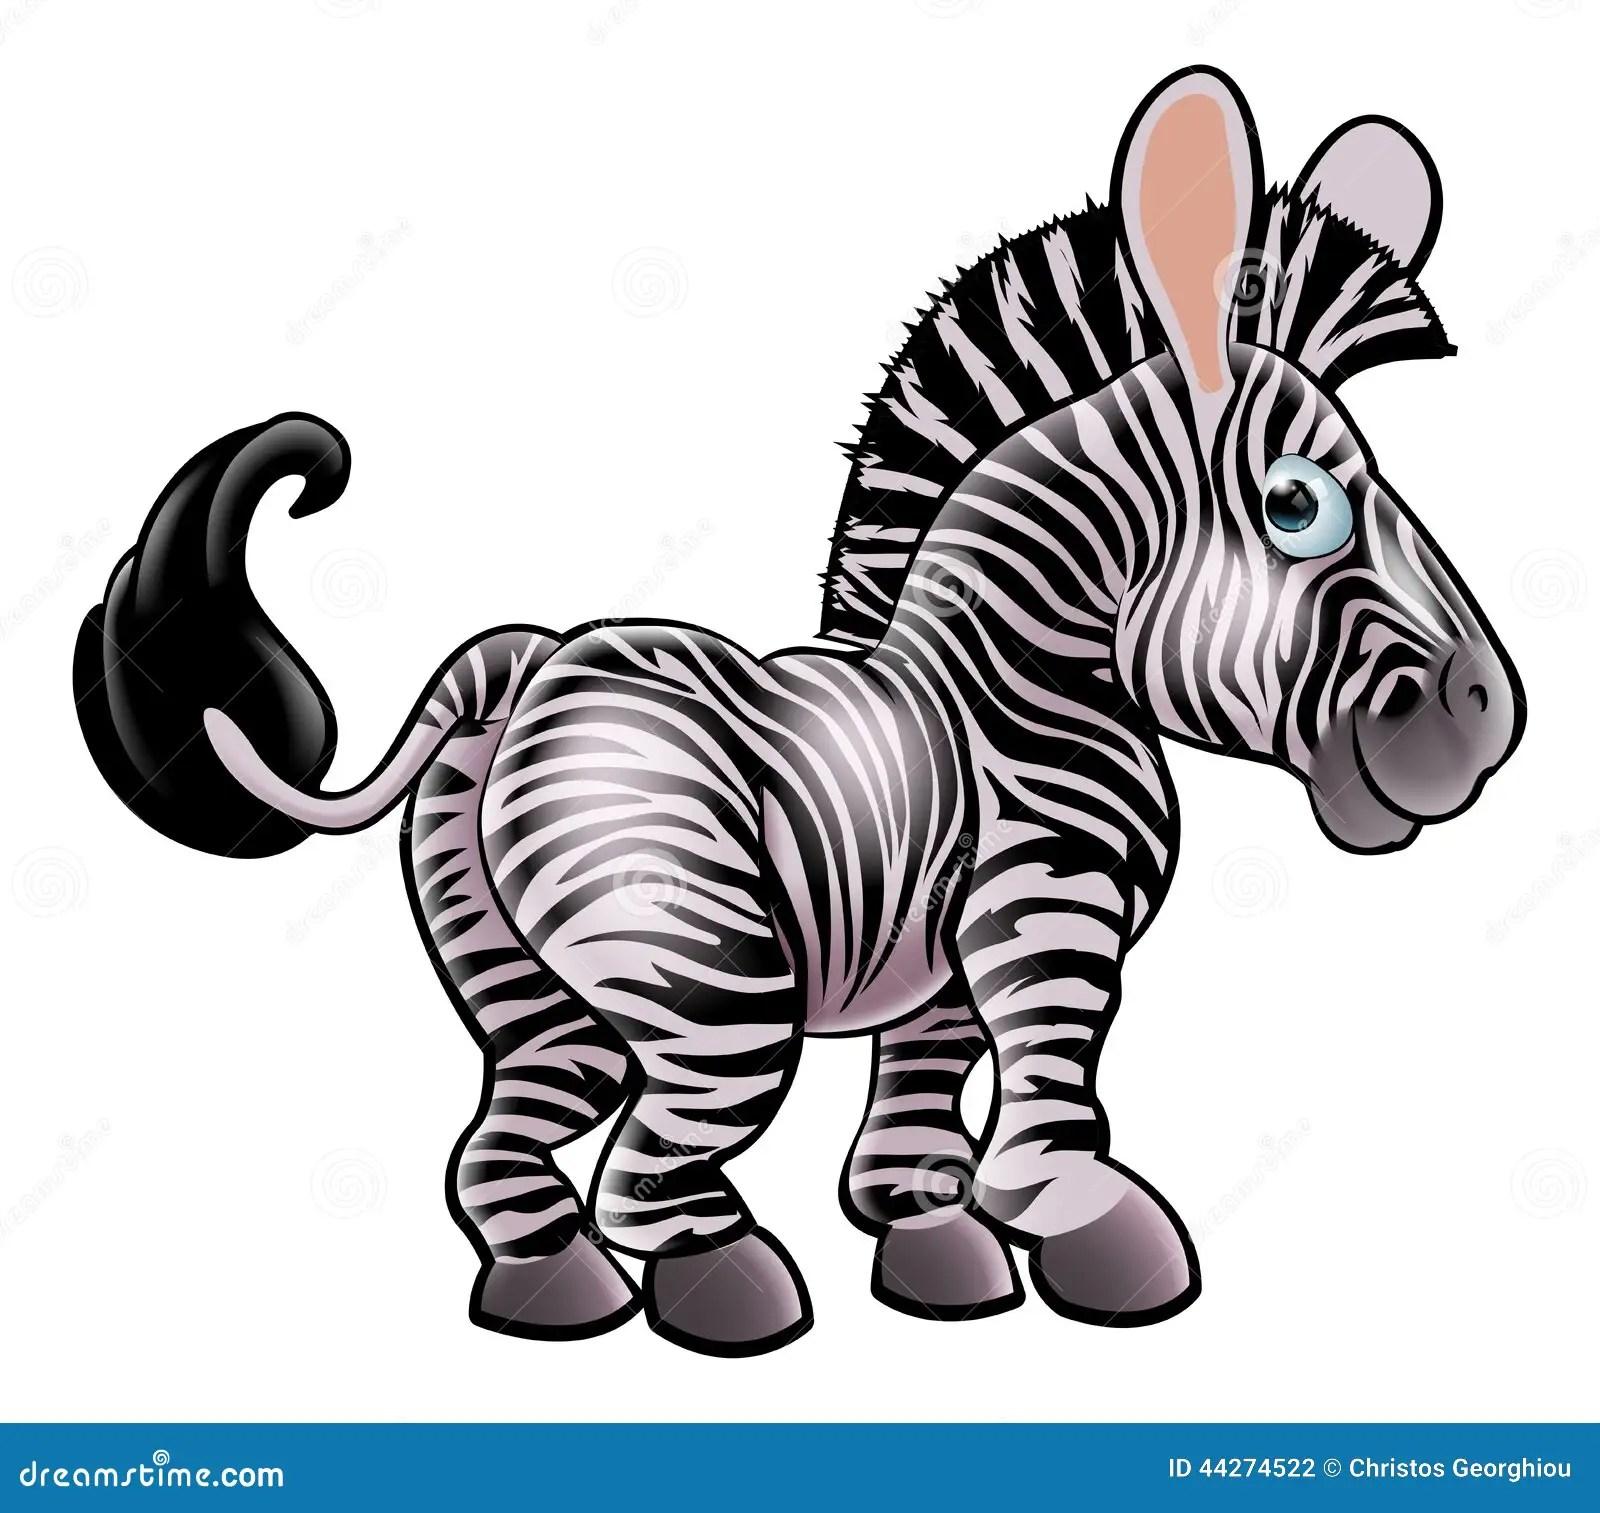 Cartoon Zebra Cartoon Vector